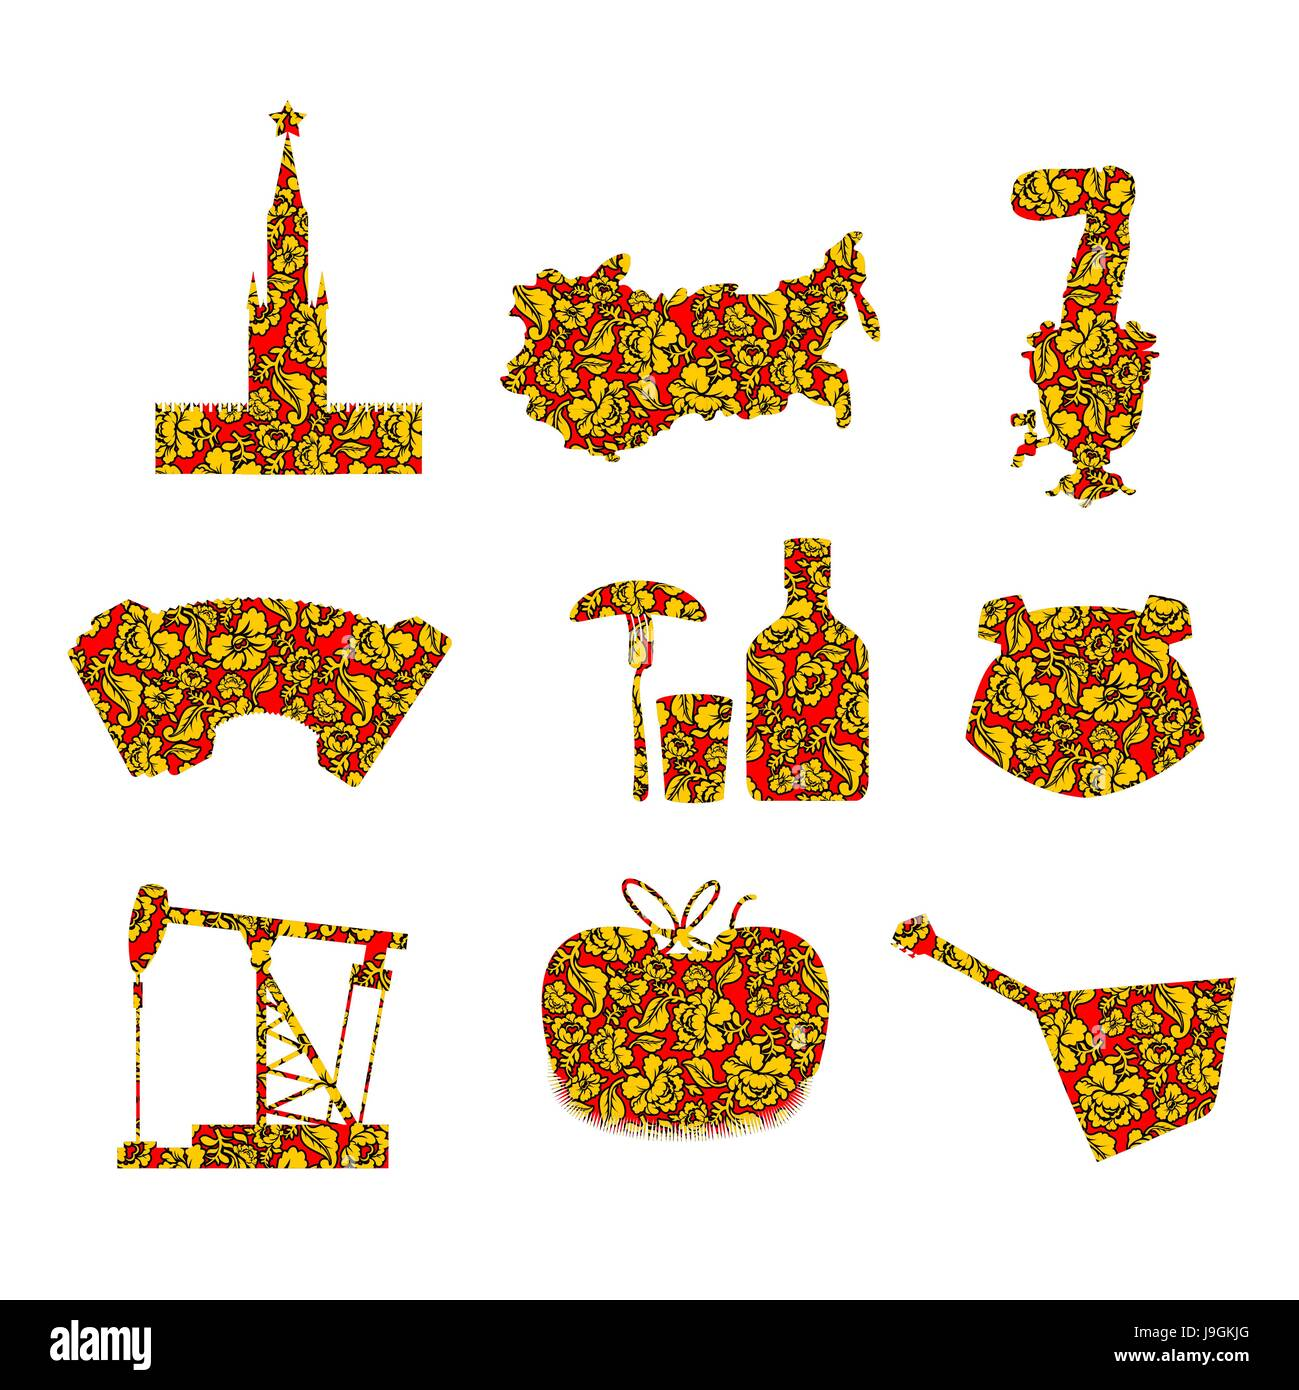 Set symbols and icons for russia kremlin and balalaika oil rig set symbols and icons for russia kremlin and balalaika oil rig and vodka with earflaps and samovar dumplings and accordion flag of russian federa buycottarizona